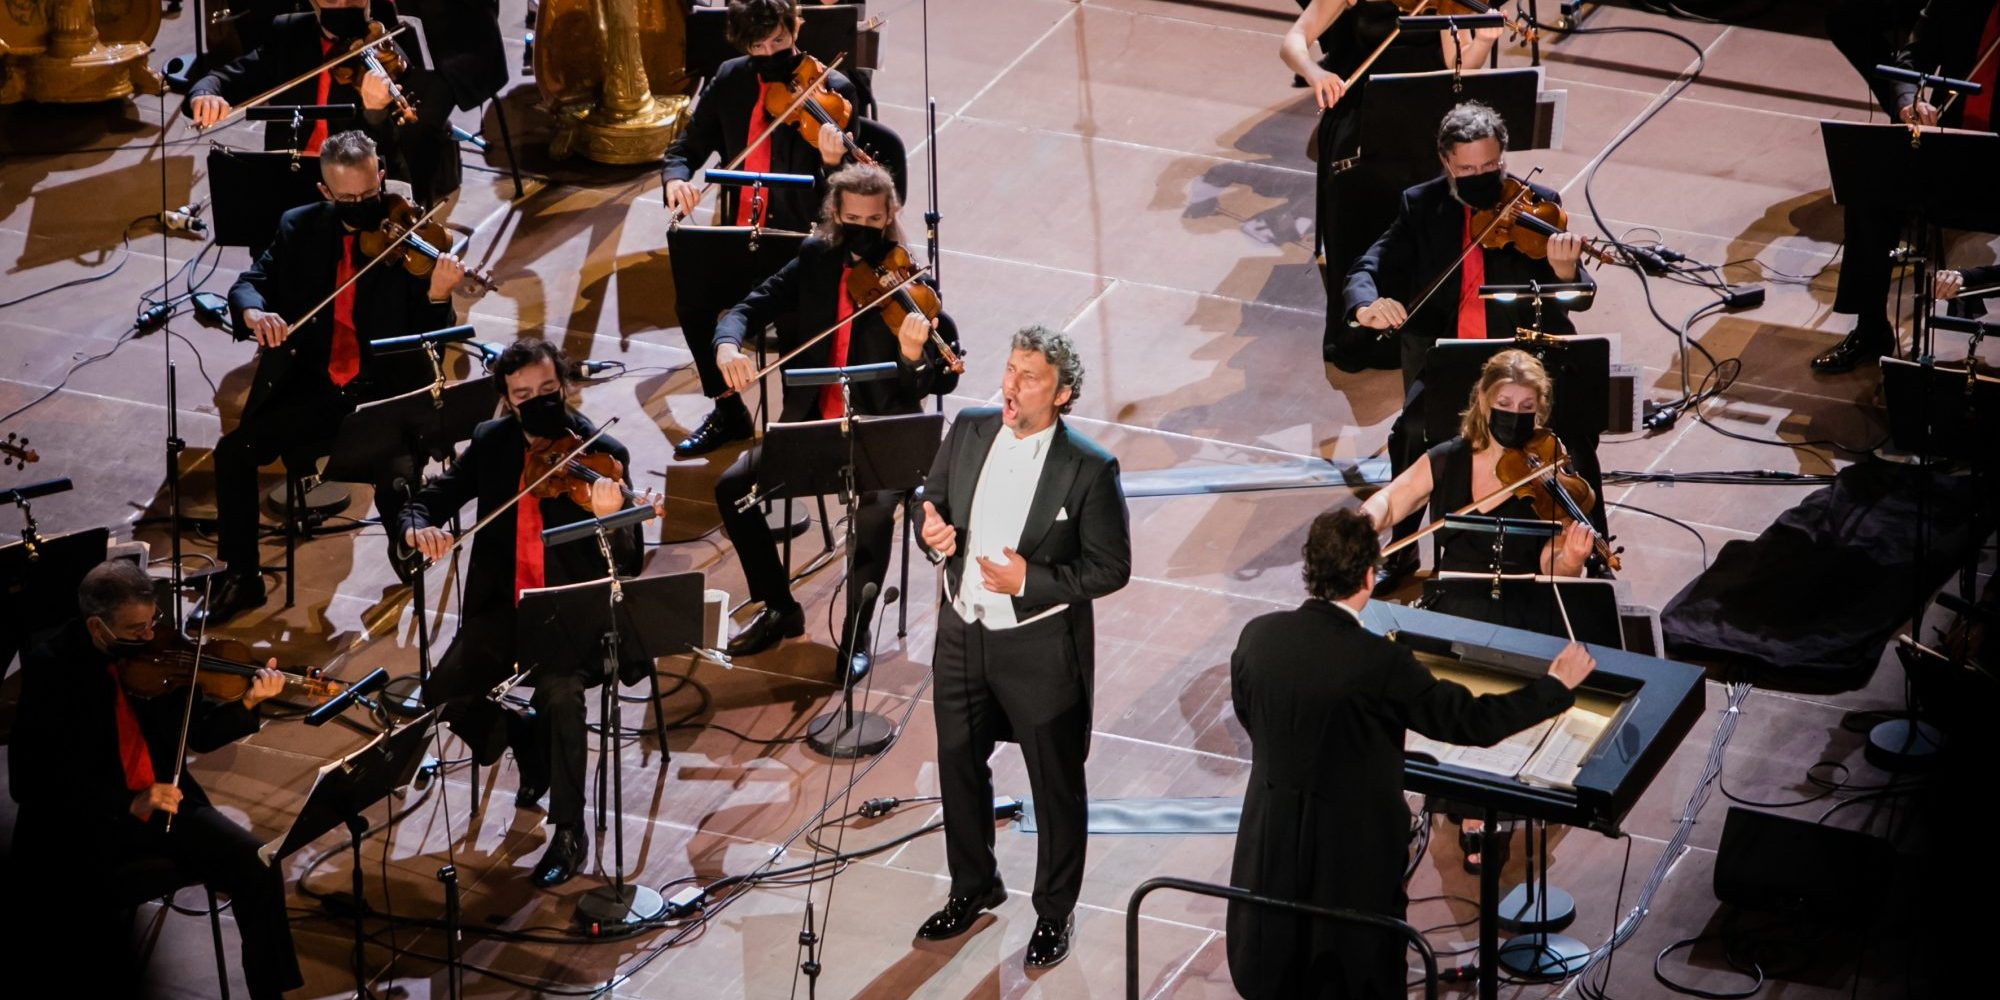 Jonas Kaufmann: Η Rolex ήταν χορηγός στη συναυλία του μεγάλου τενόρου στο Ηρώδειο